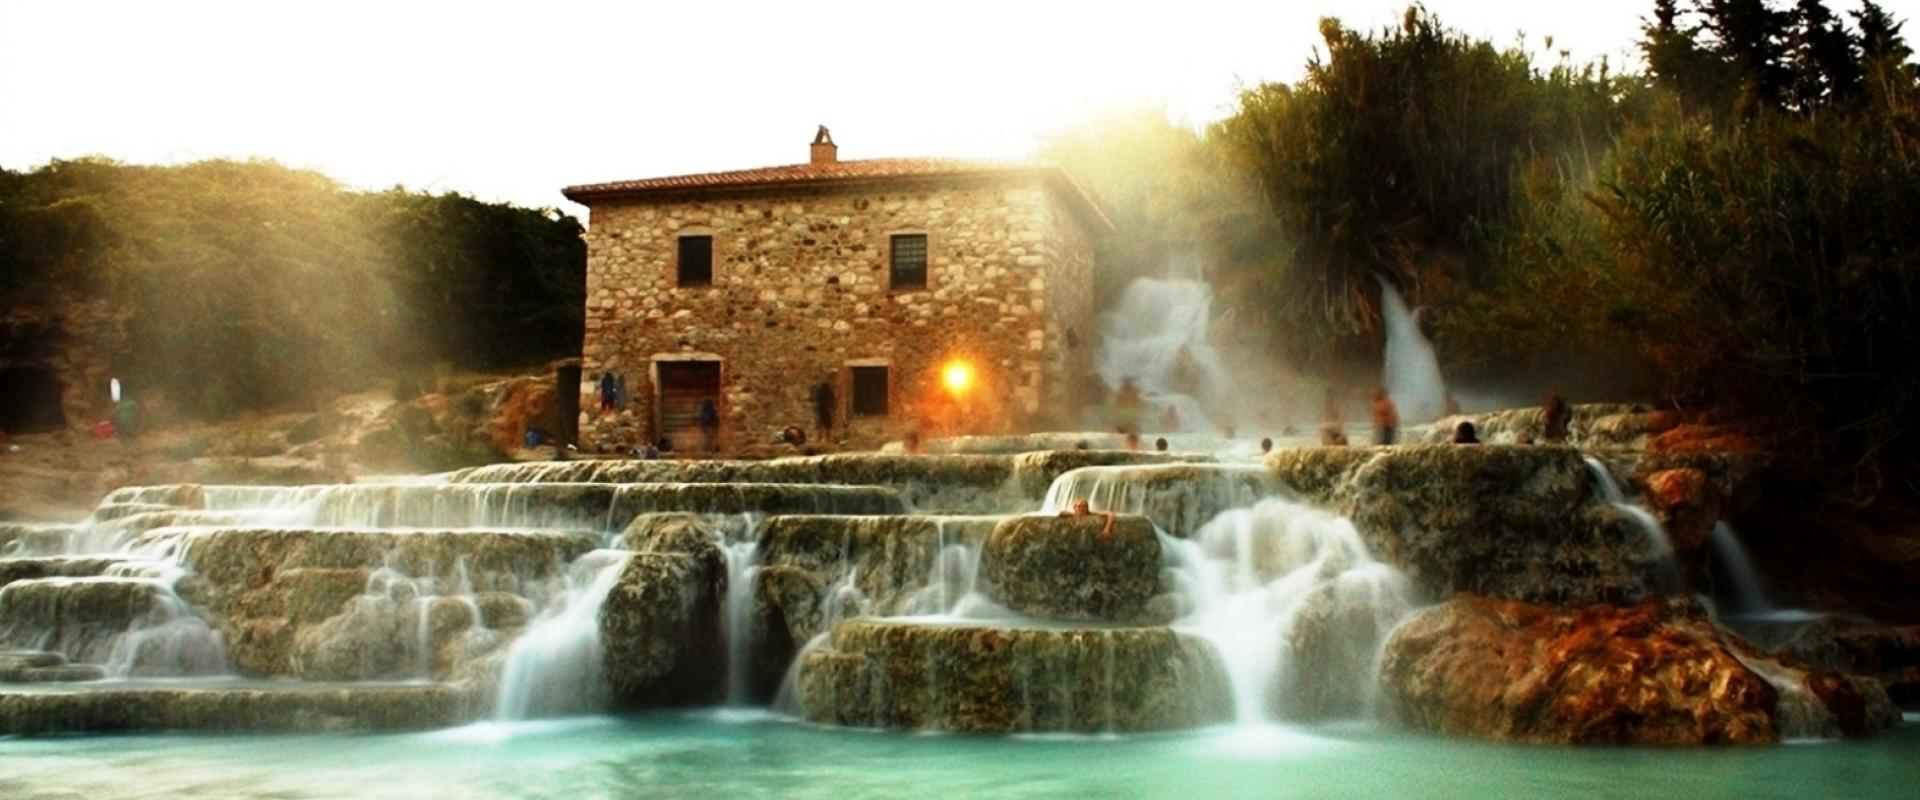 Visit of Saturni Tuscany